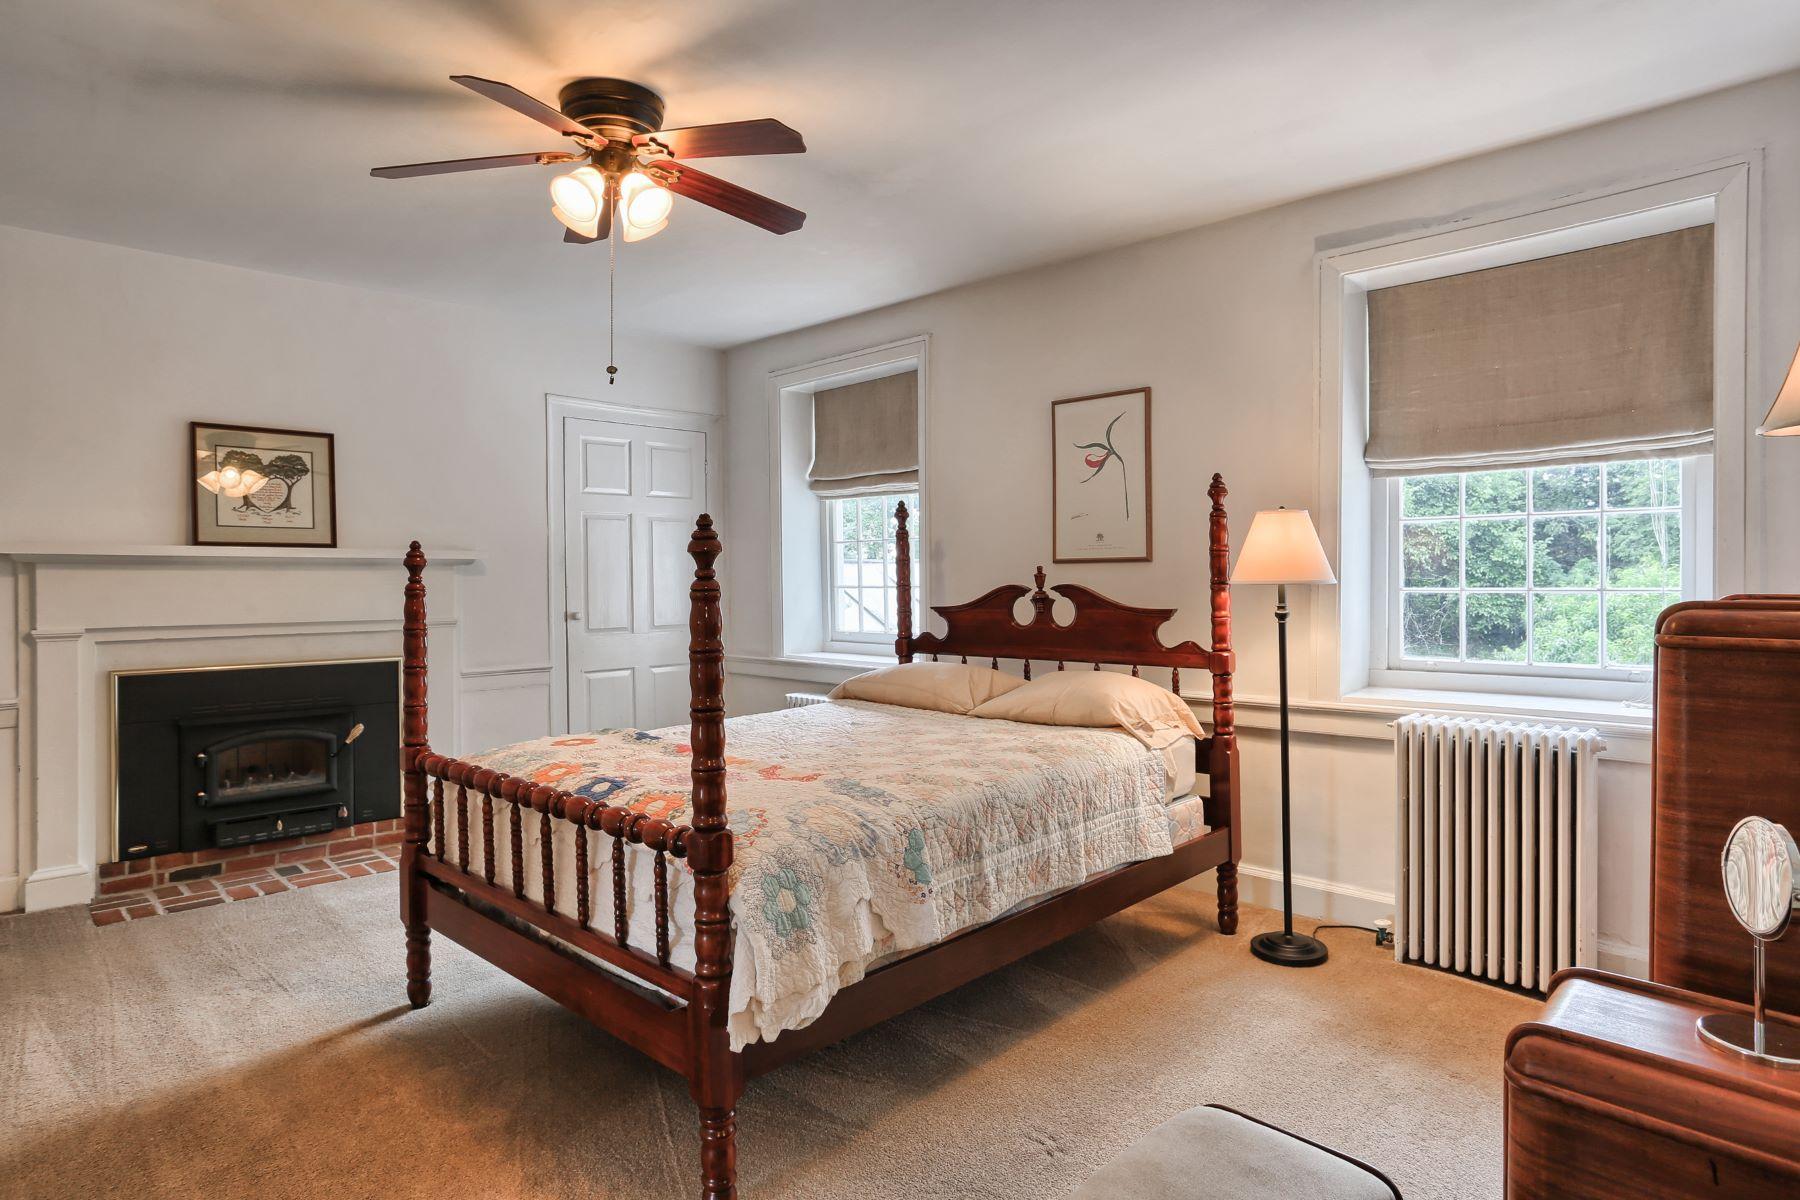 Additional photo for property listing at 2408 Walnut Bottom Road  Carlisle, Pennsylvania 17015 United States